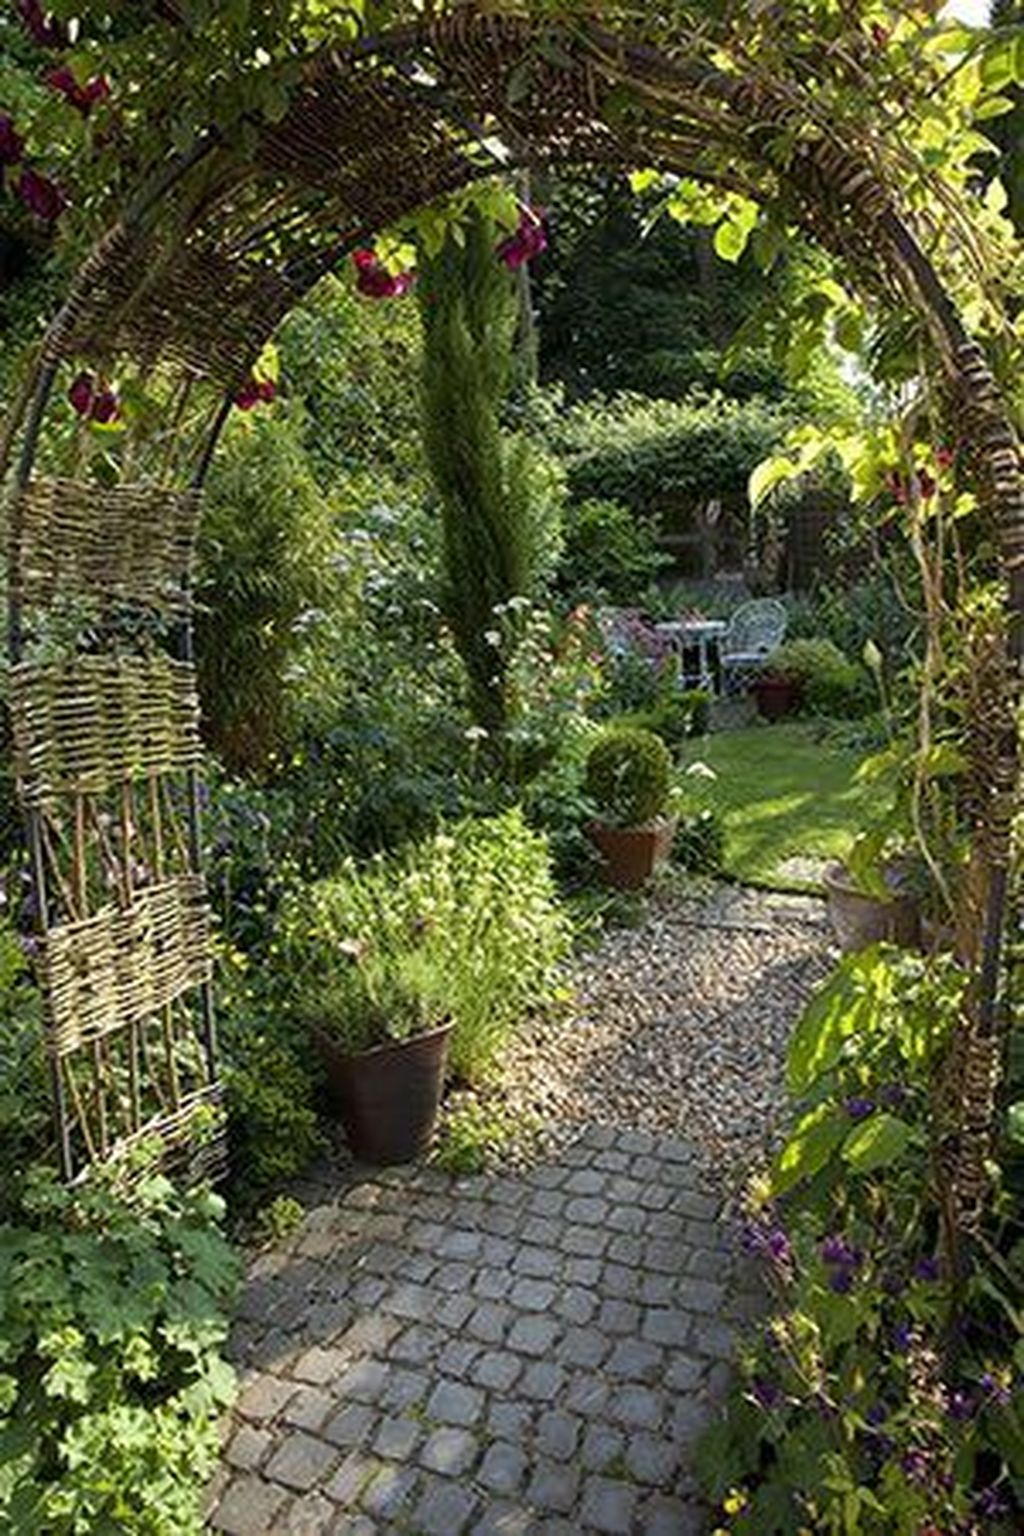 The Best Urban Garden Design Ideas For Your Backyard 08